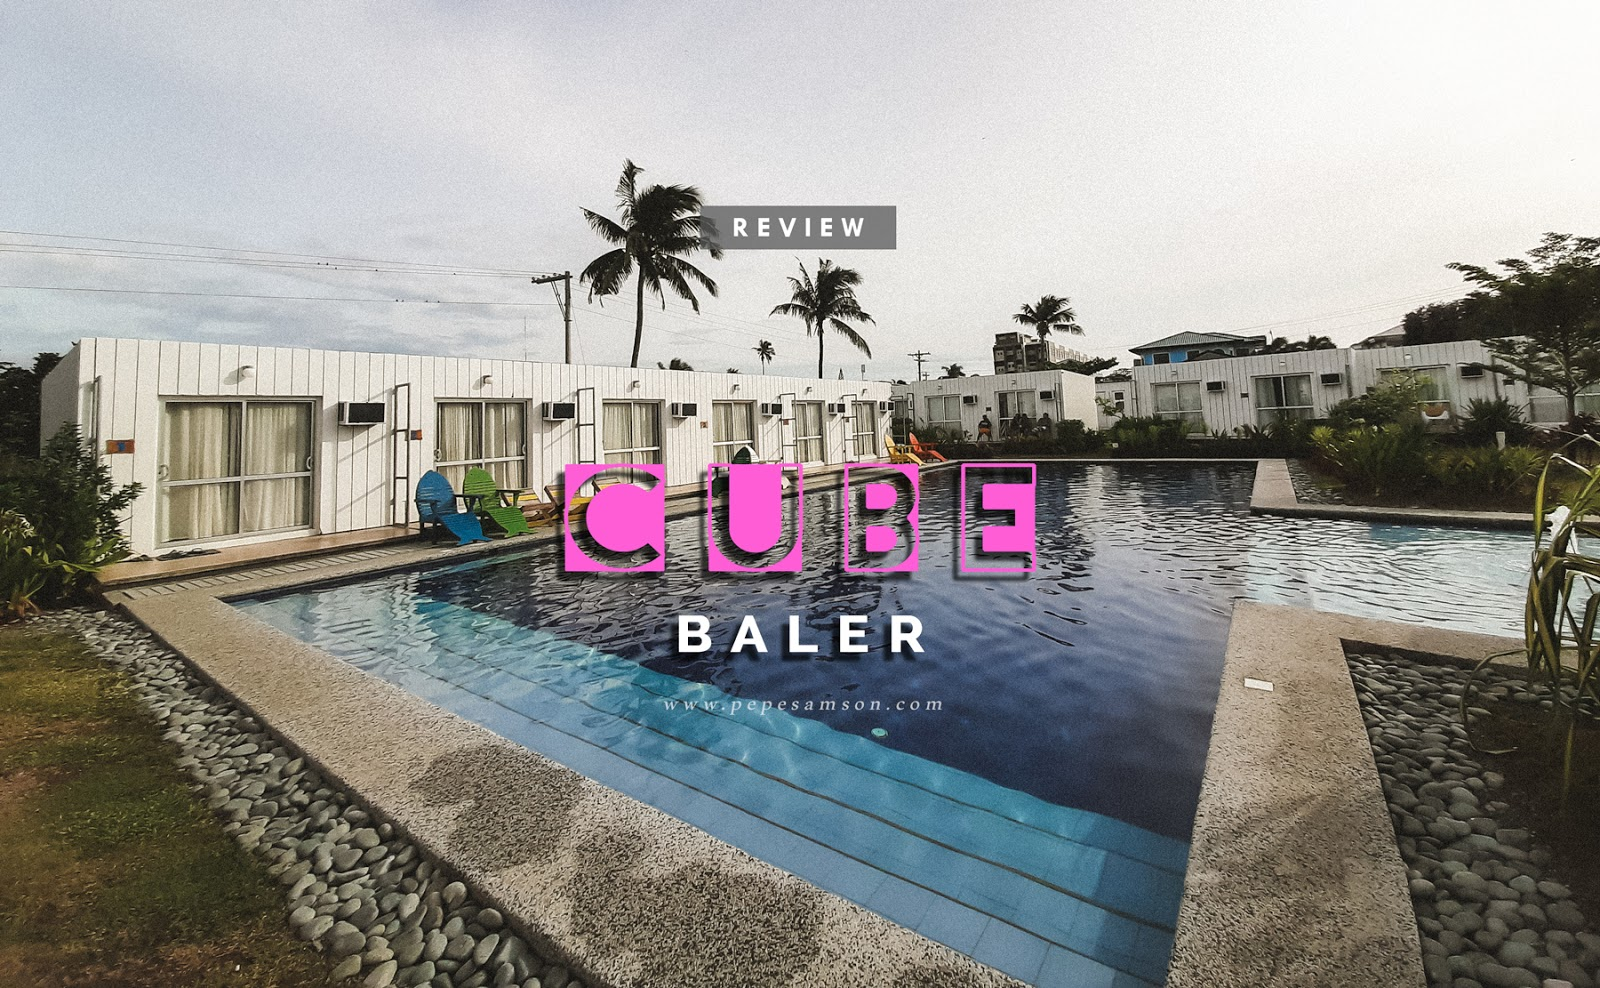 cube baler